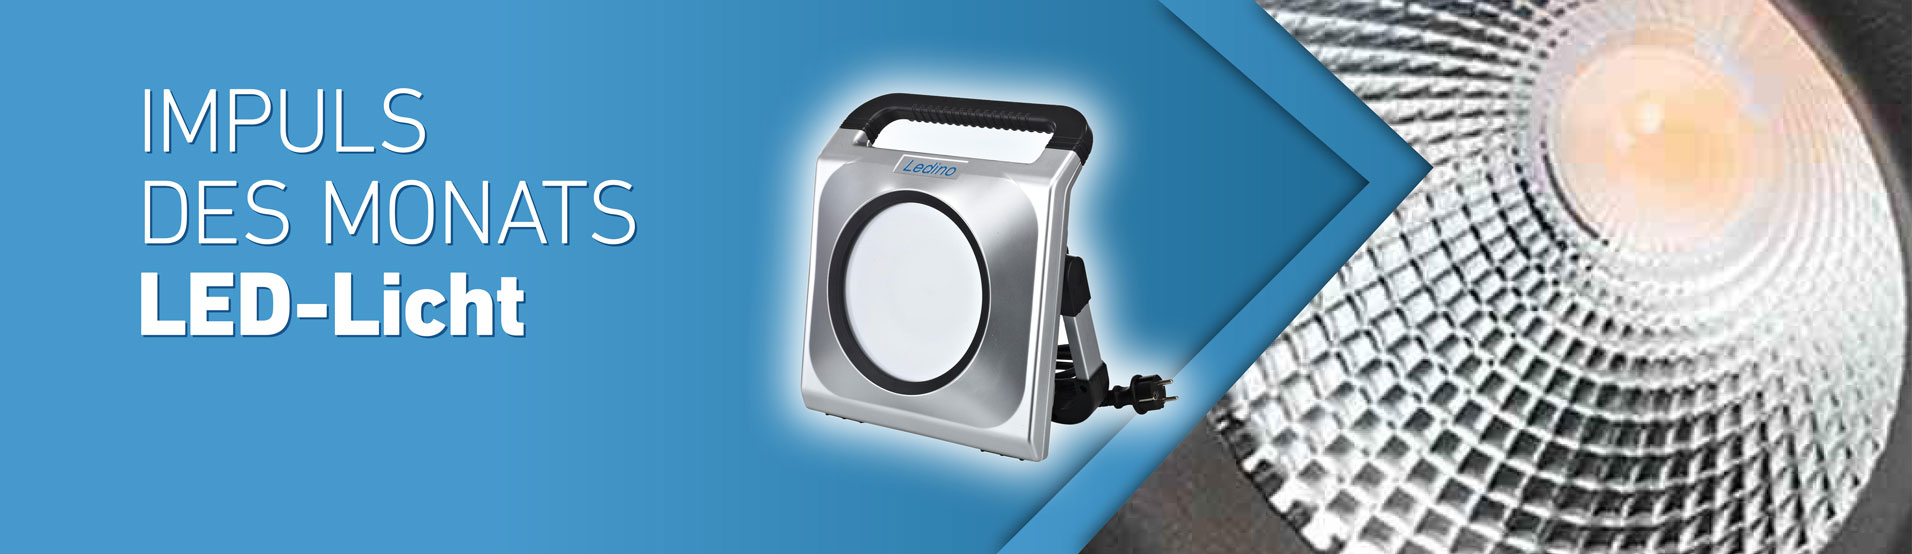 K1 Electronic Impuls des Monats November 2020 LED-Licht LED Licht